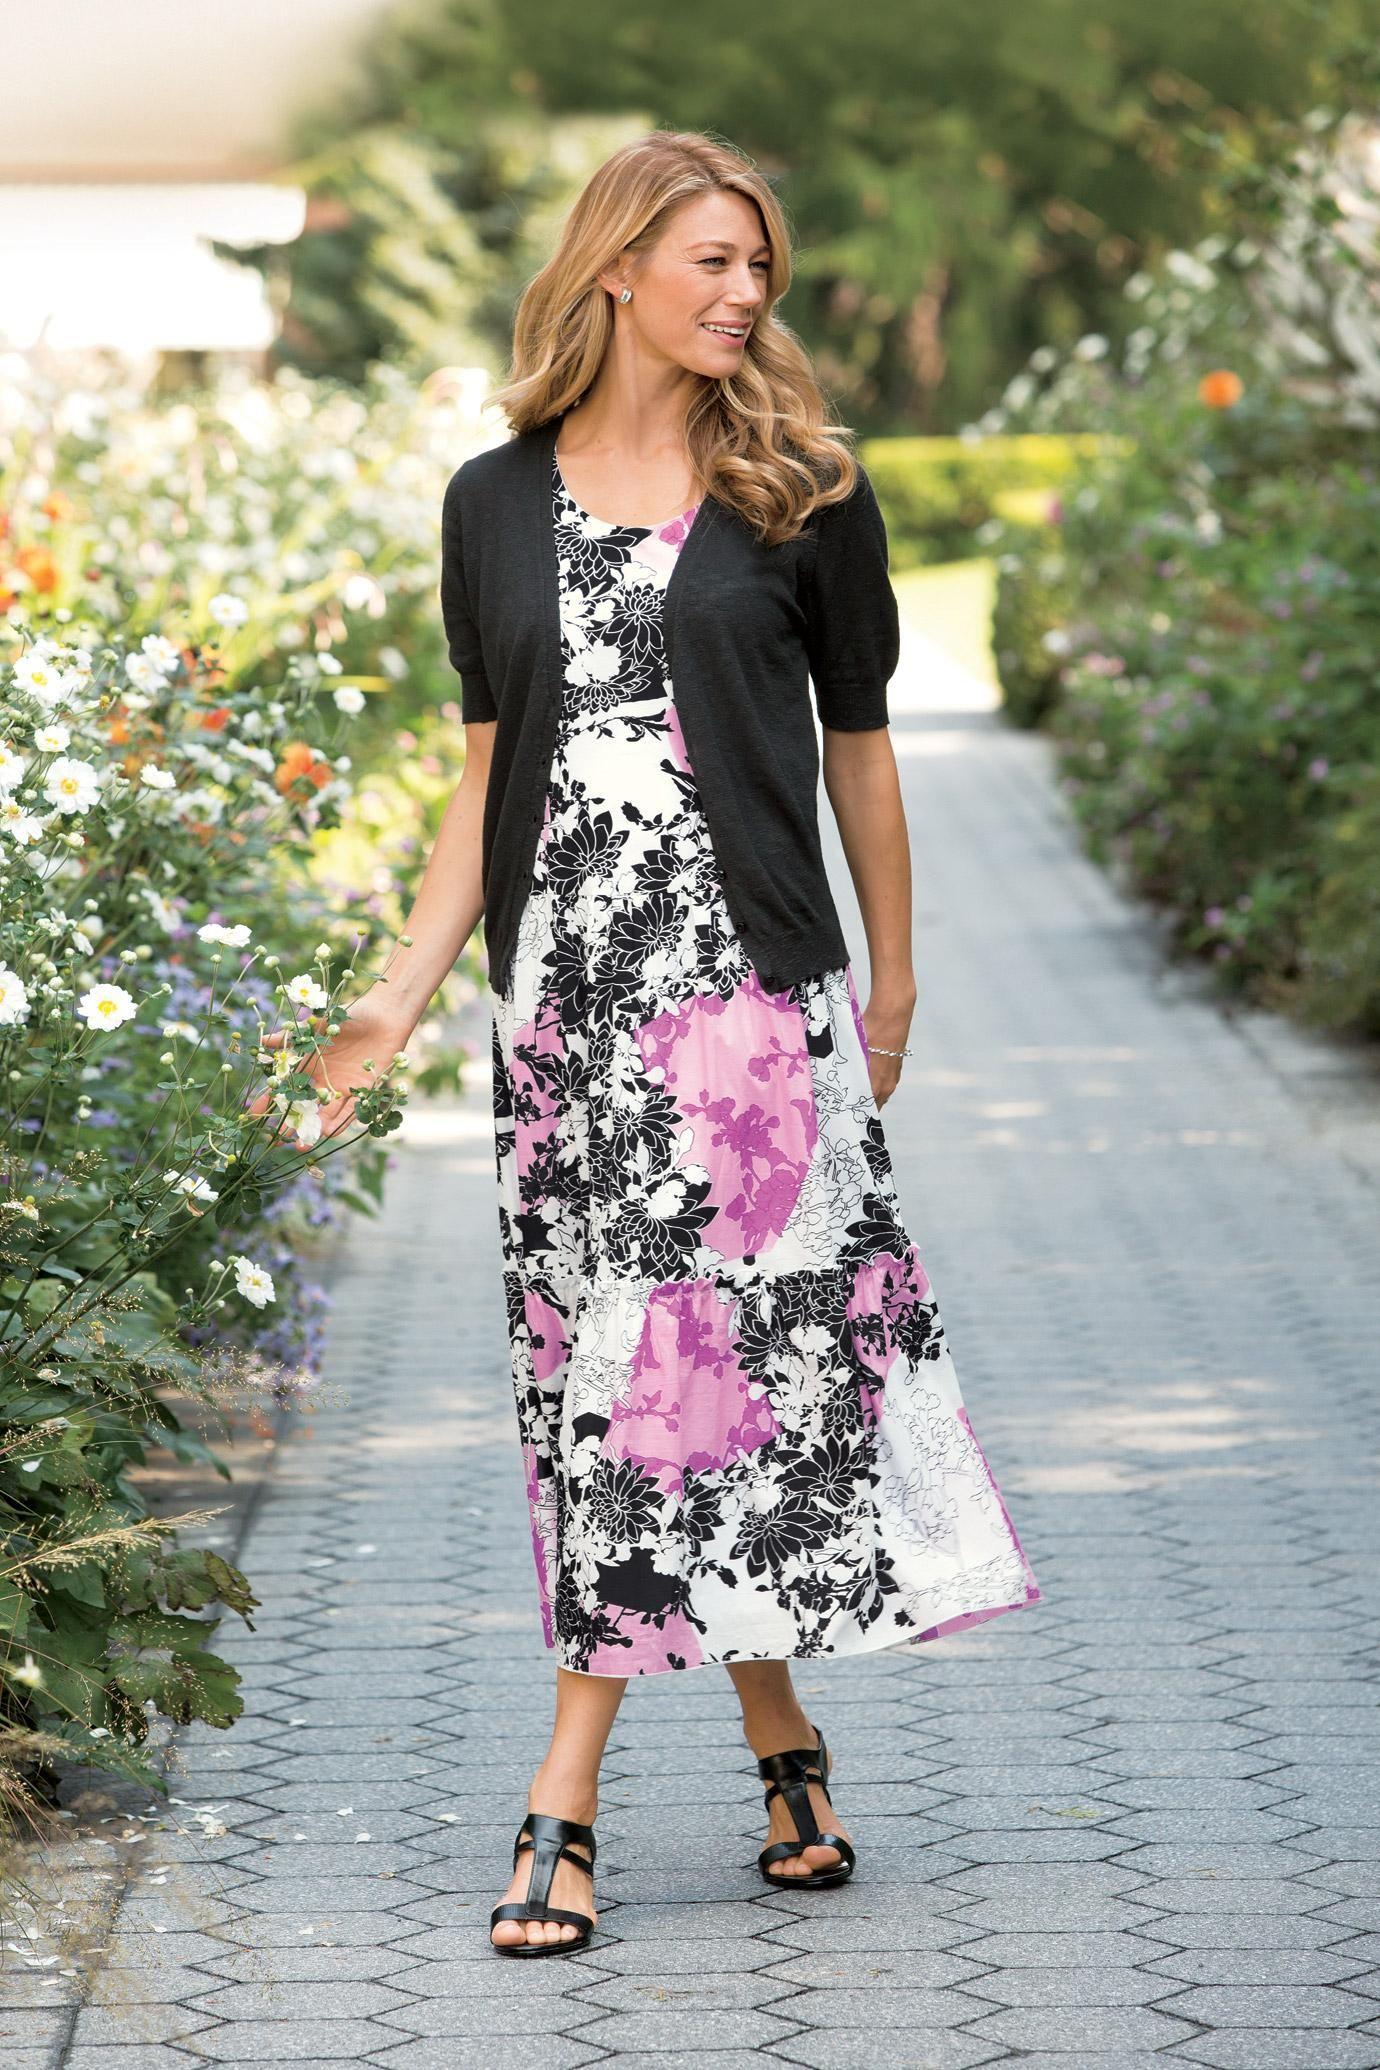 Graphic Floral Dress & Short Sleeve Cardigan   Fashion   Pinterest ...